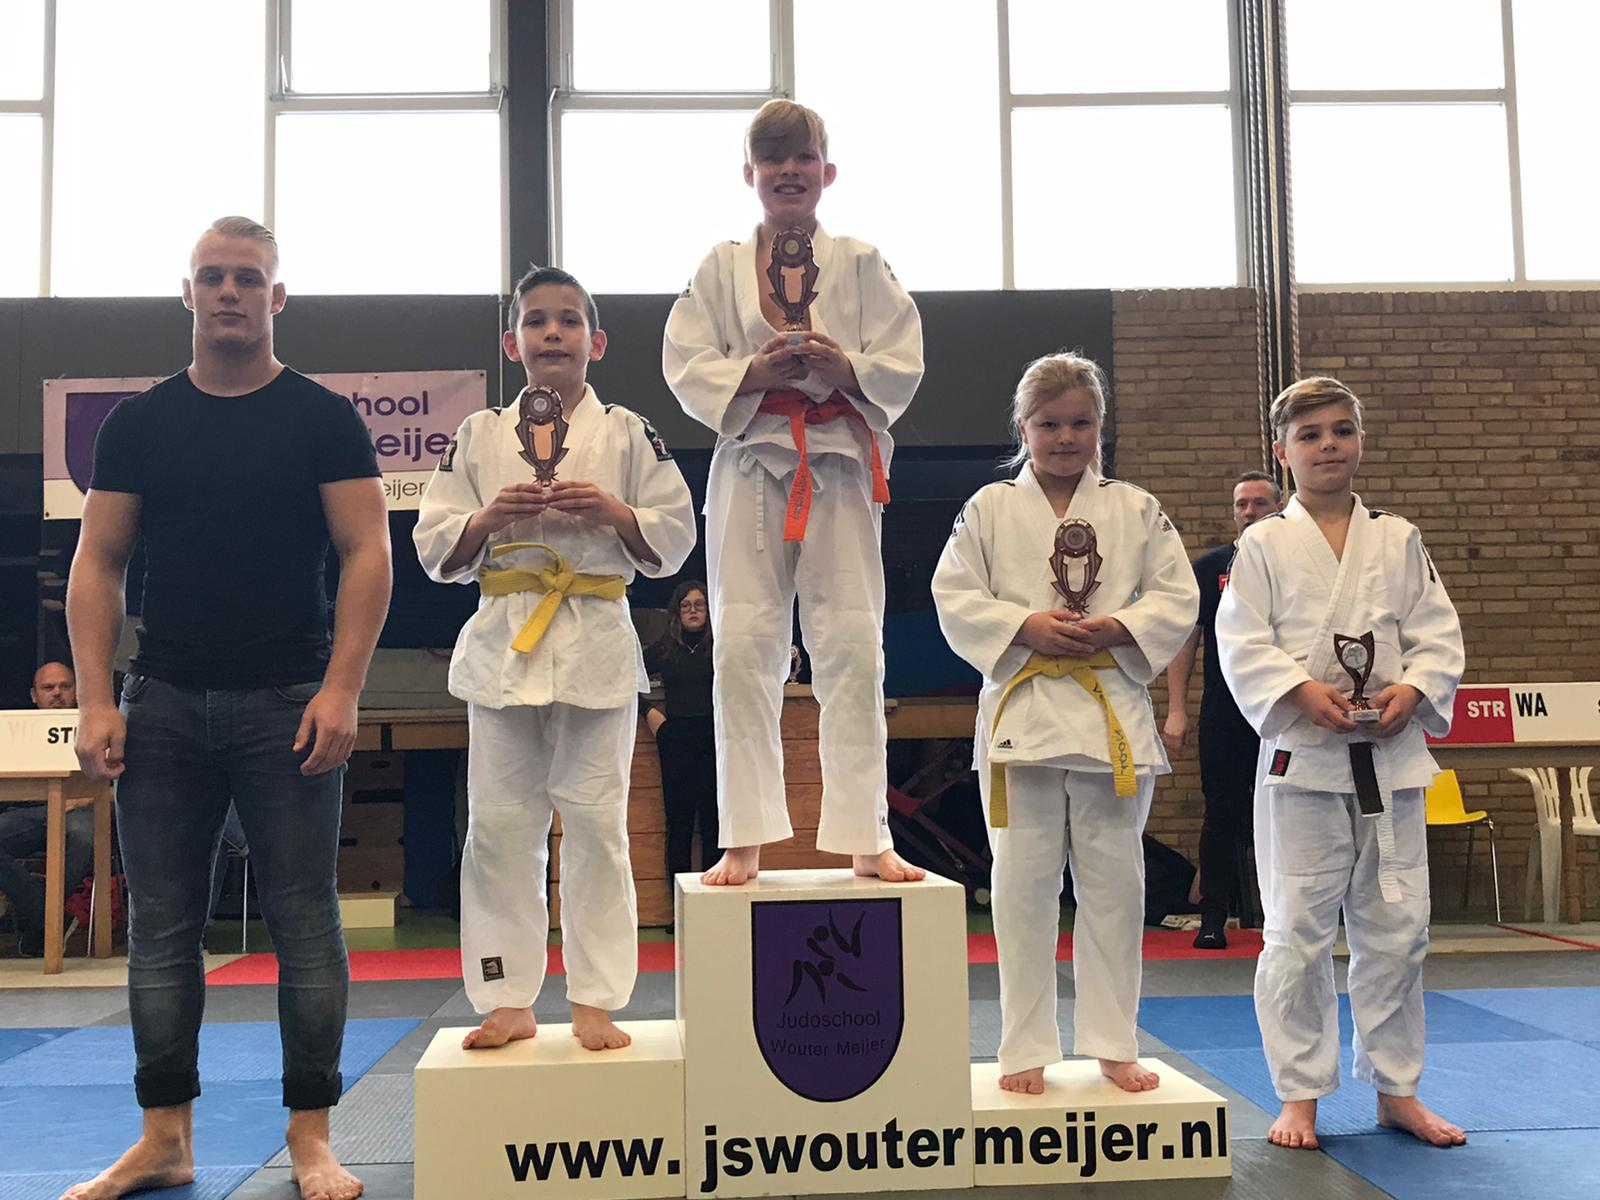 Judoka's Sakaee in de prijzen tijdens regiotoernooi Scheemda